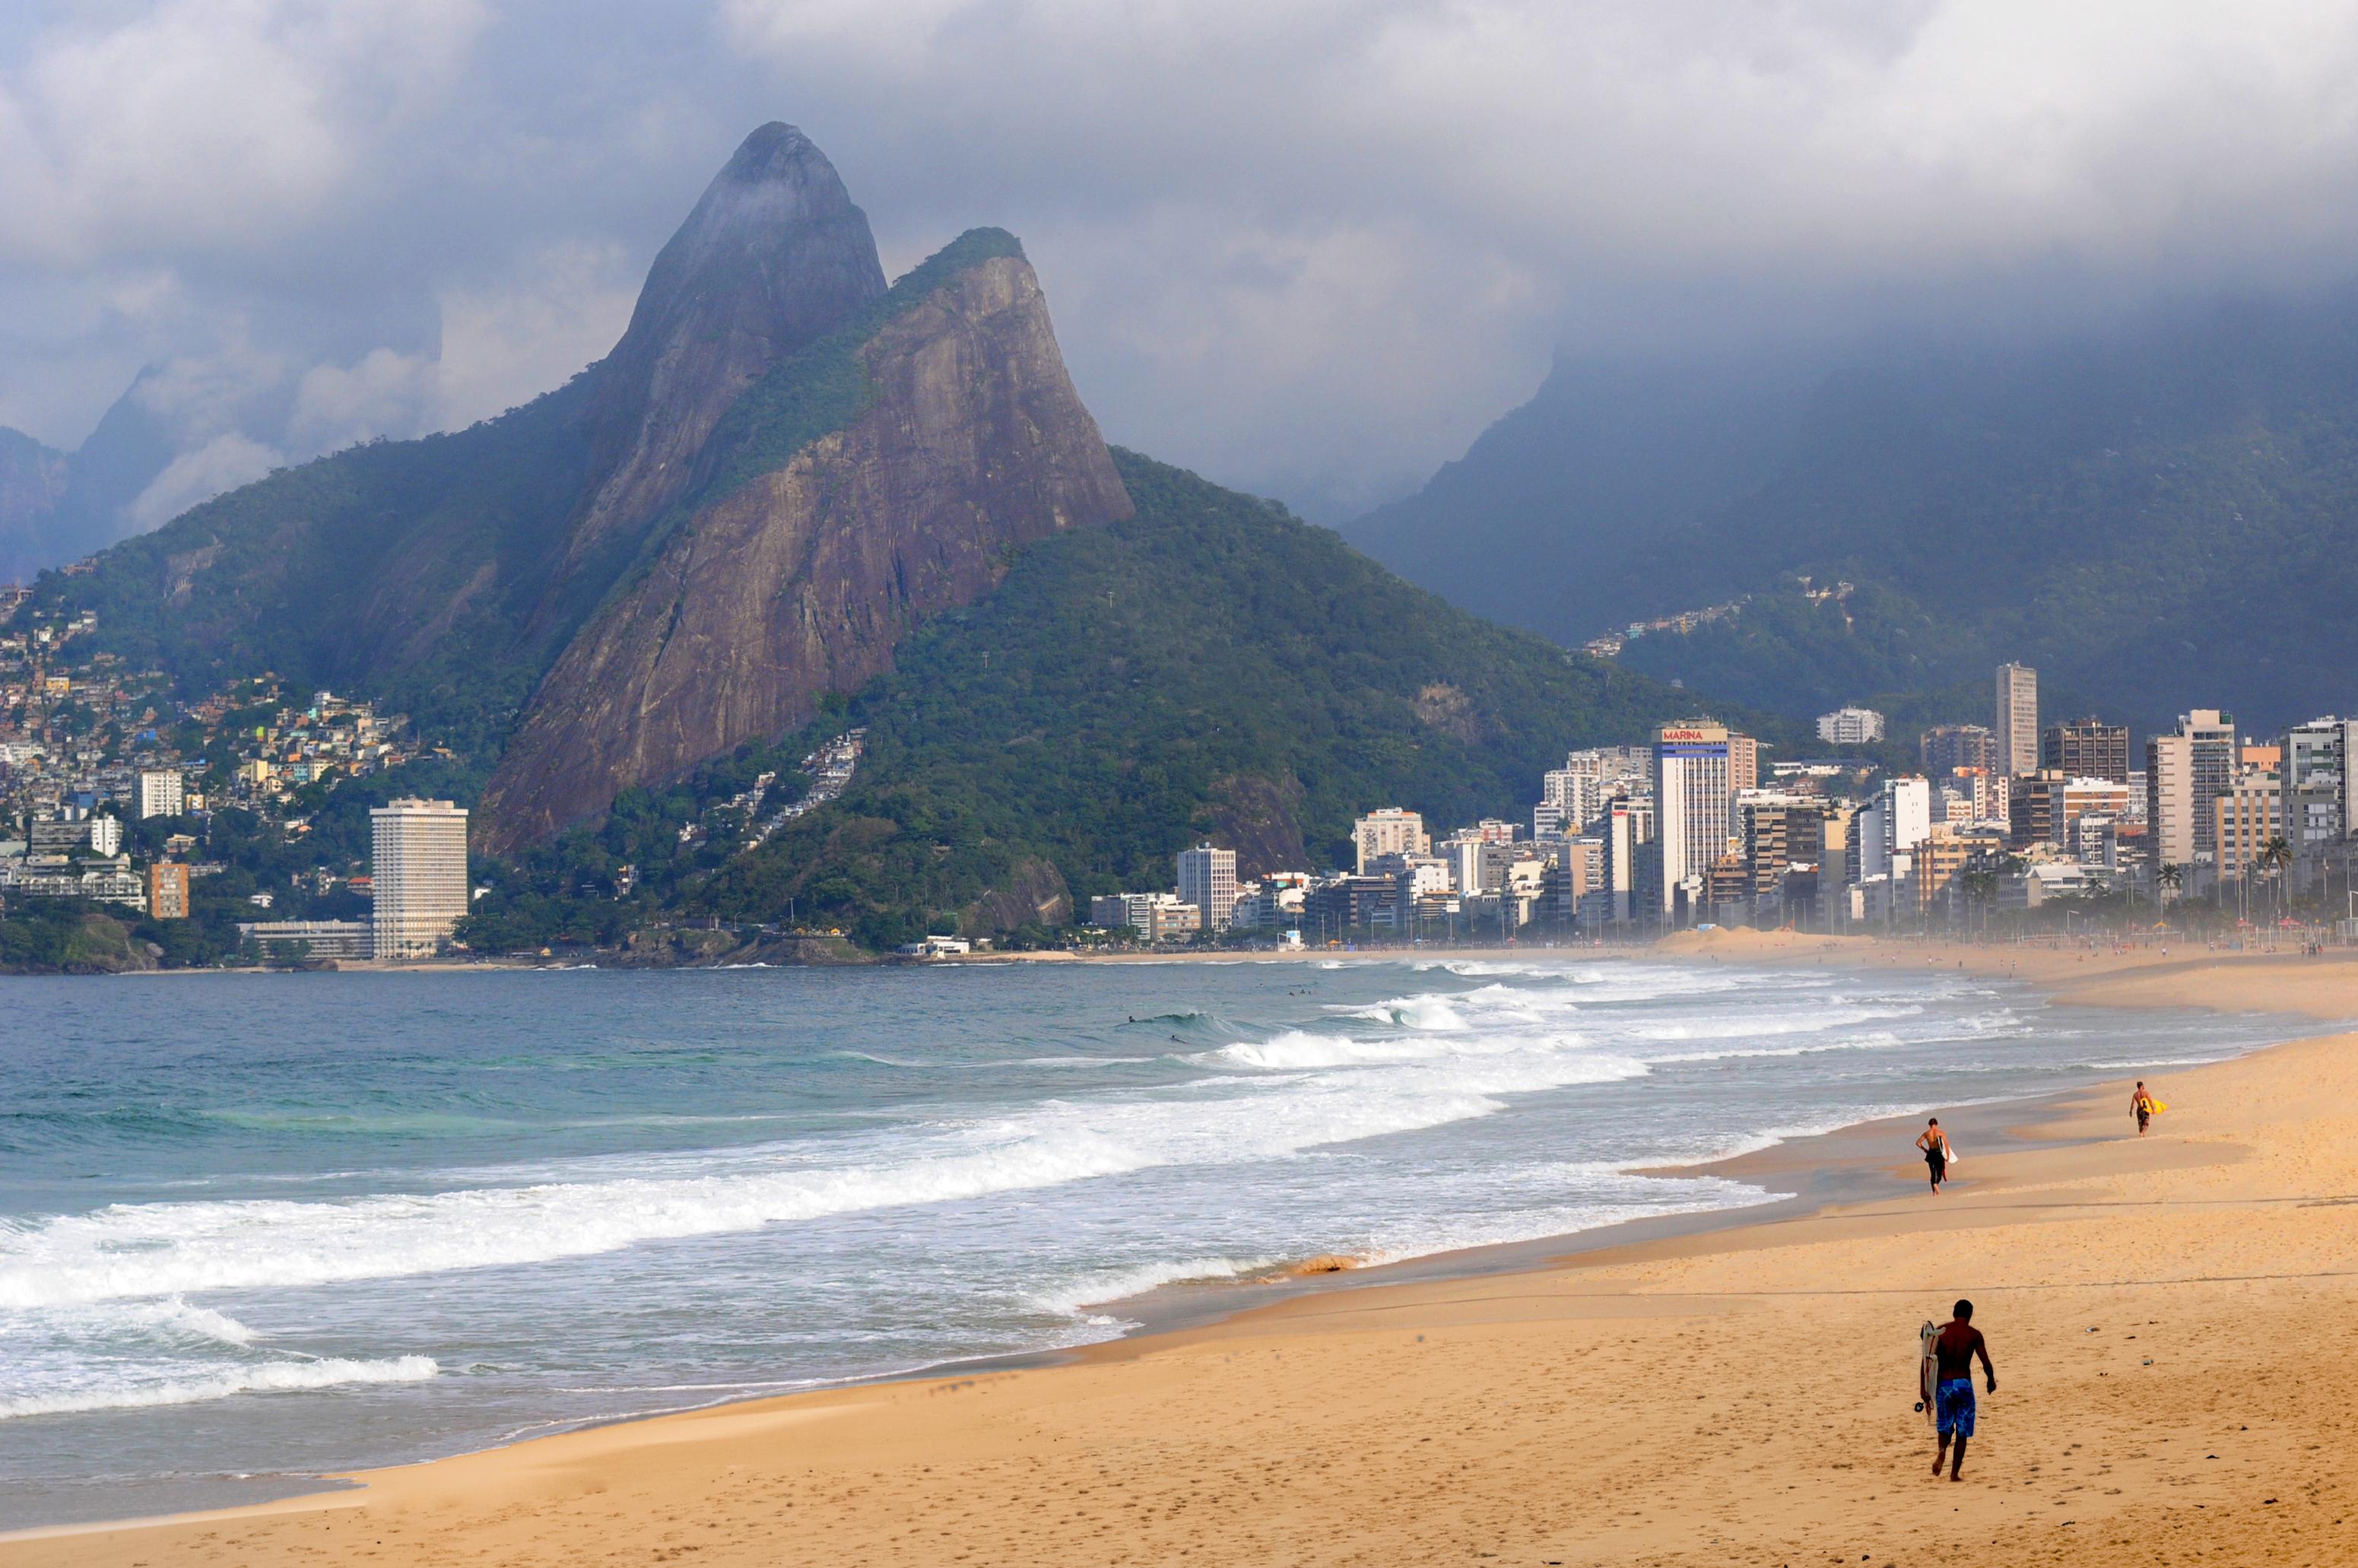 waar te kopen grote korting geweldige aanbiedingen File:Praia de Ipanema Rio de Janeiro.jpg - Wikimedia Commons